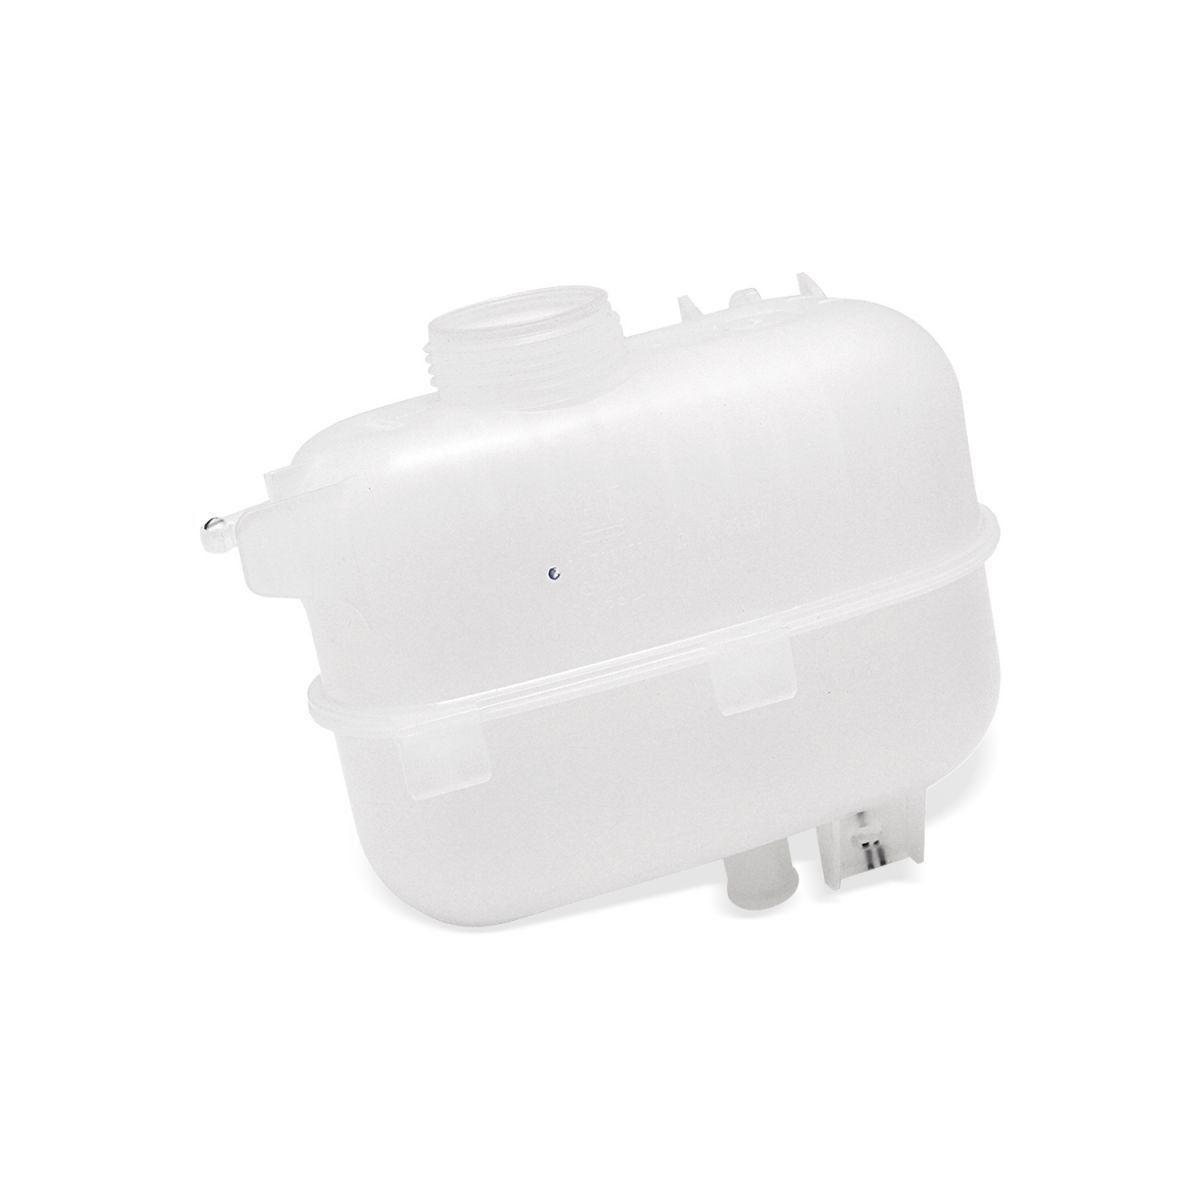 Reservatorio d'agua radiador motor 1.0/1.4/1.8 8V GAs/flex - Corsa novo 2006 a 2012